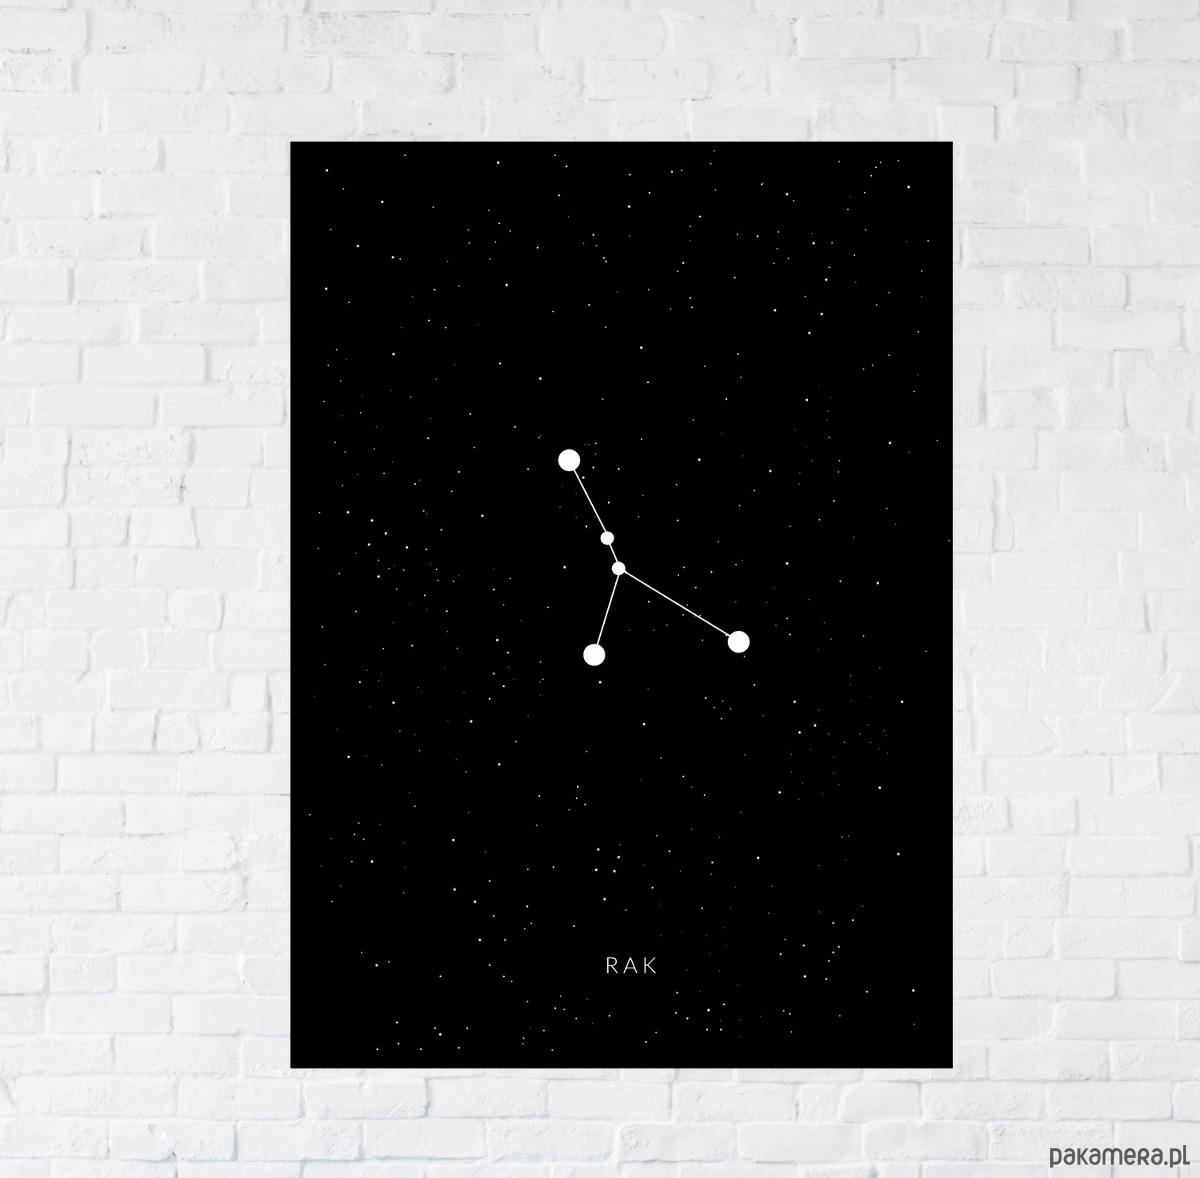 Randki znak zodiaku rak